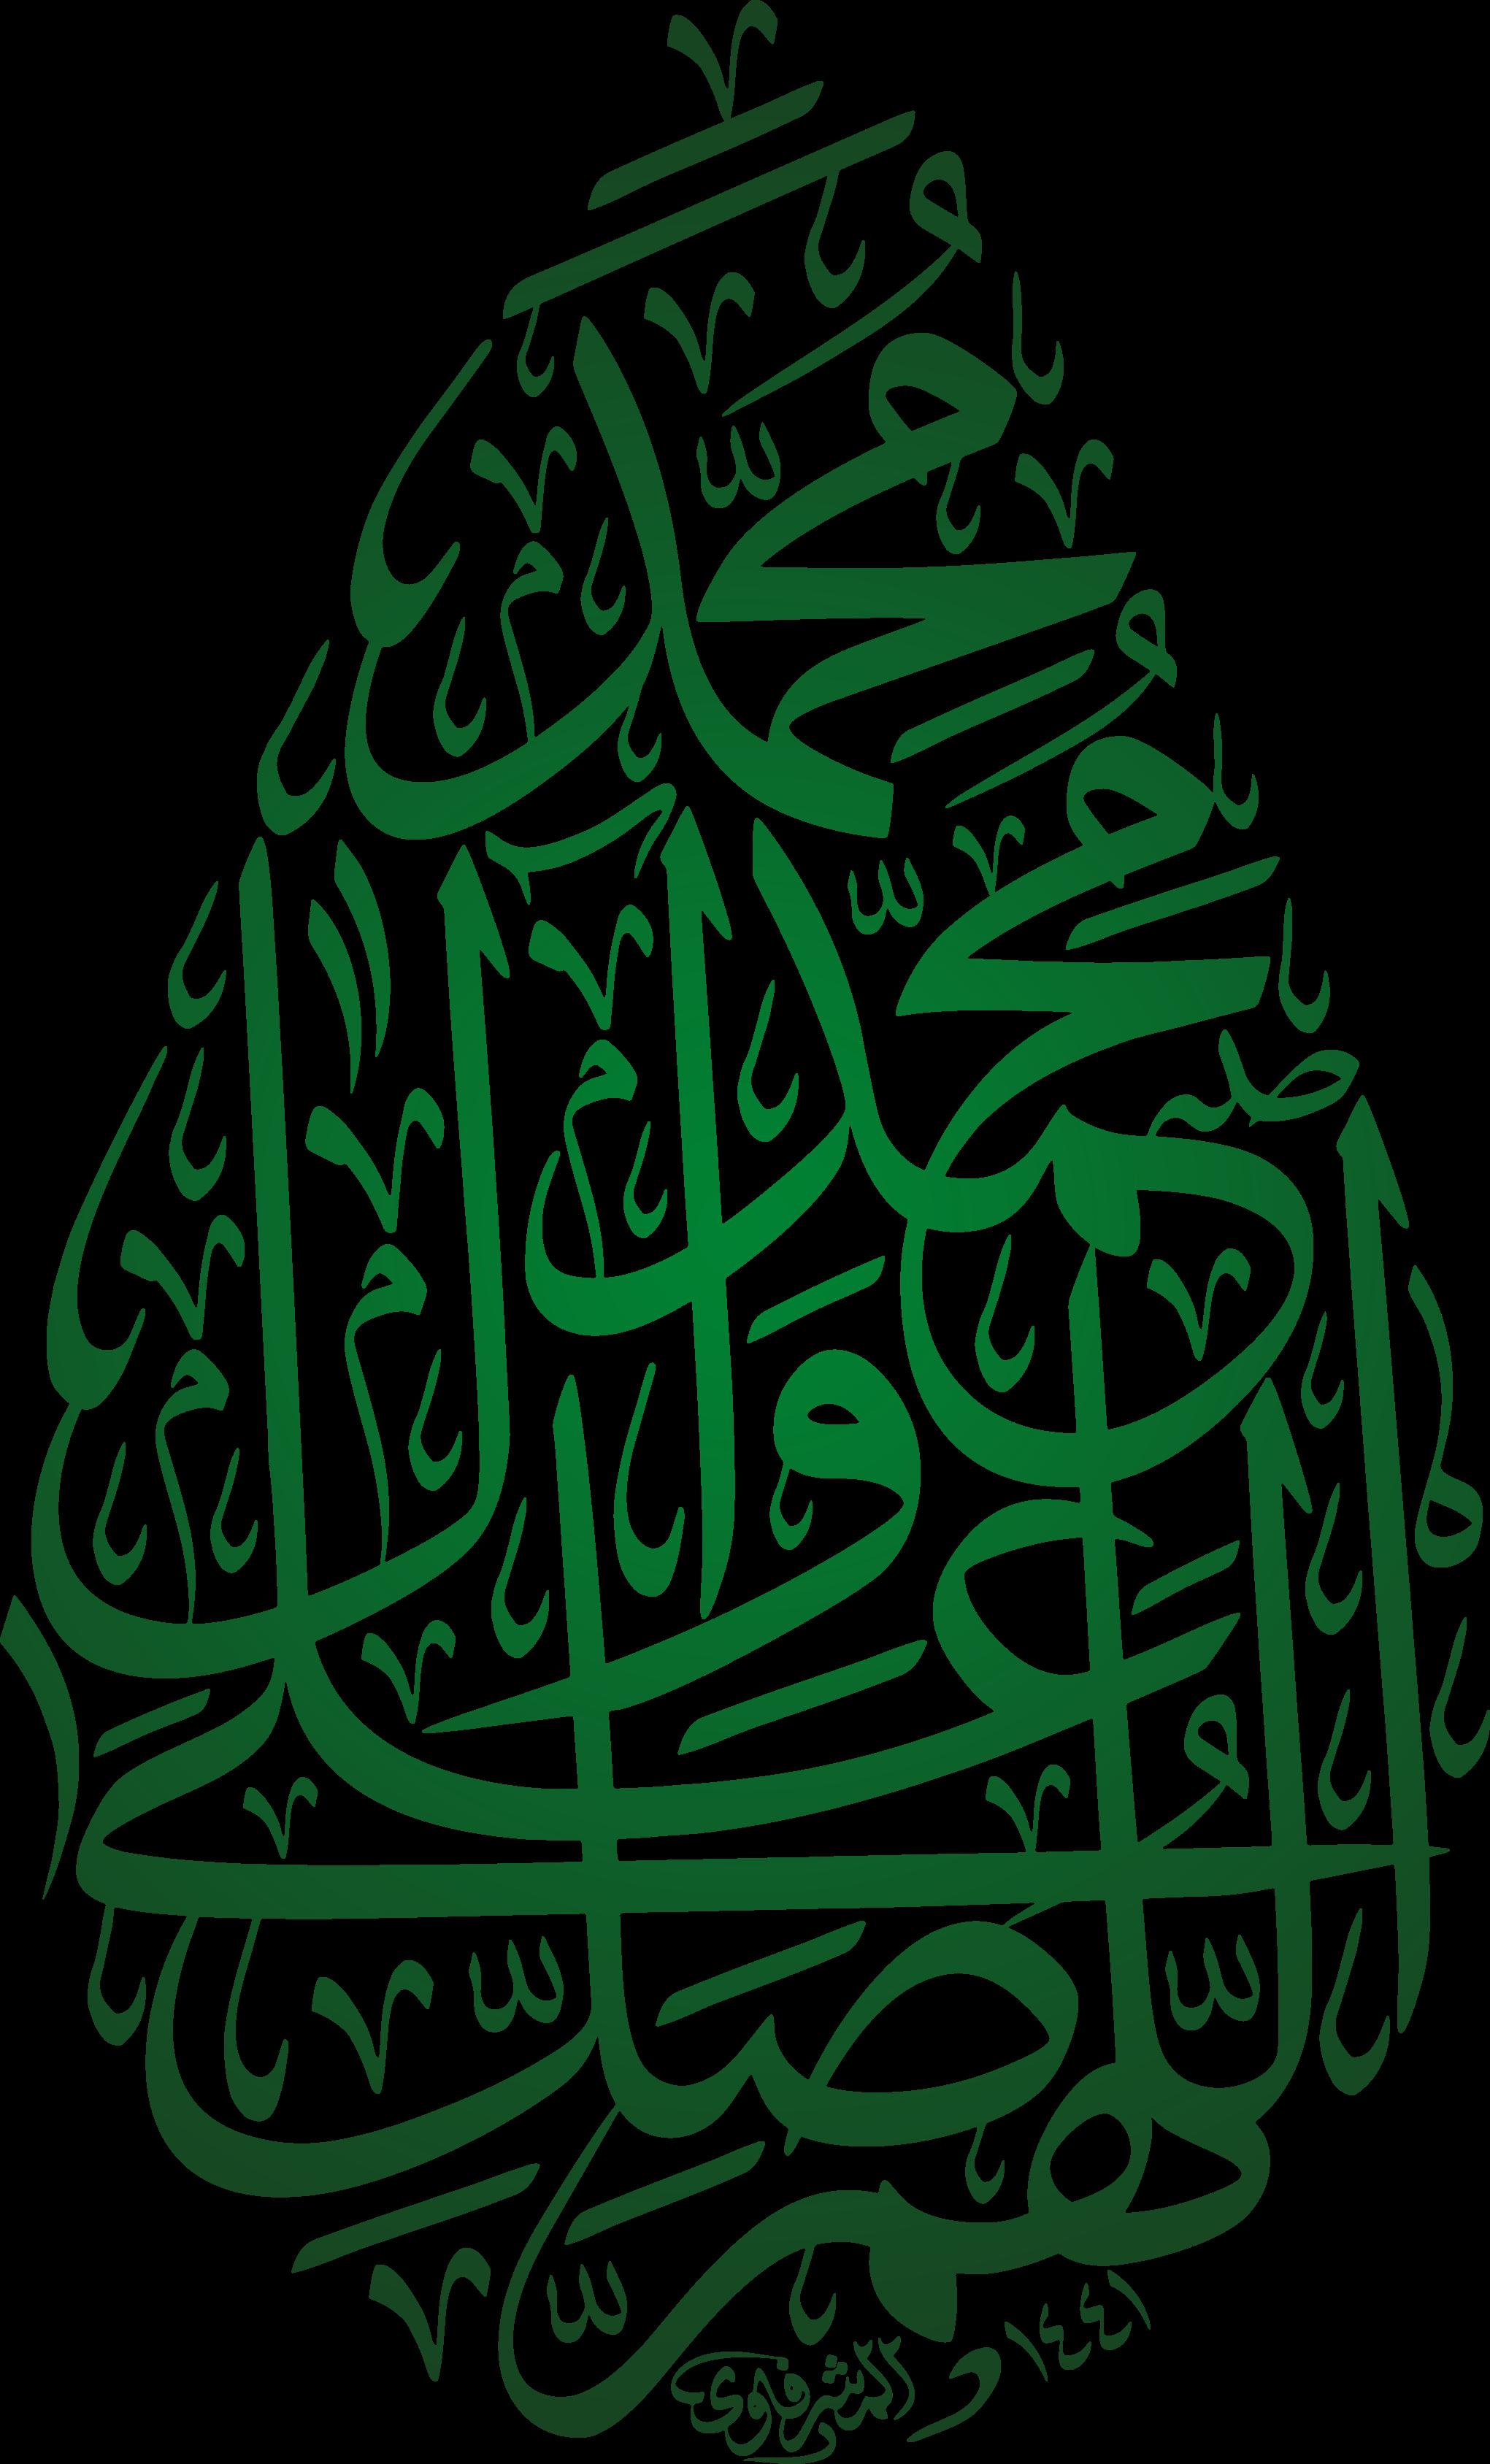 Pin By Mohammed Al Mobarak On اللهم صل على محمد و آل محمد Islamic Calligraphy Islamic Pictures Hoop Art